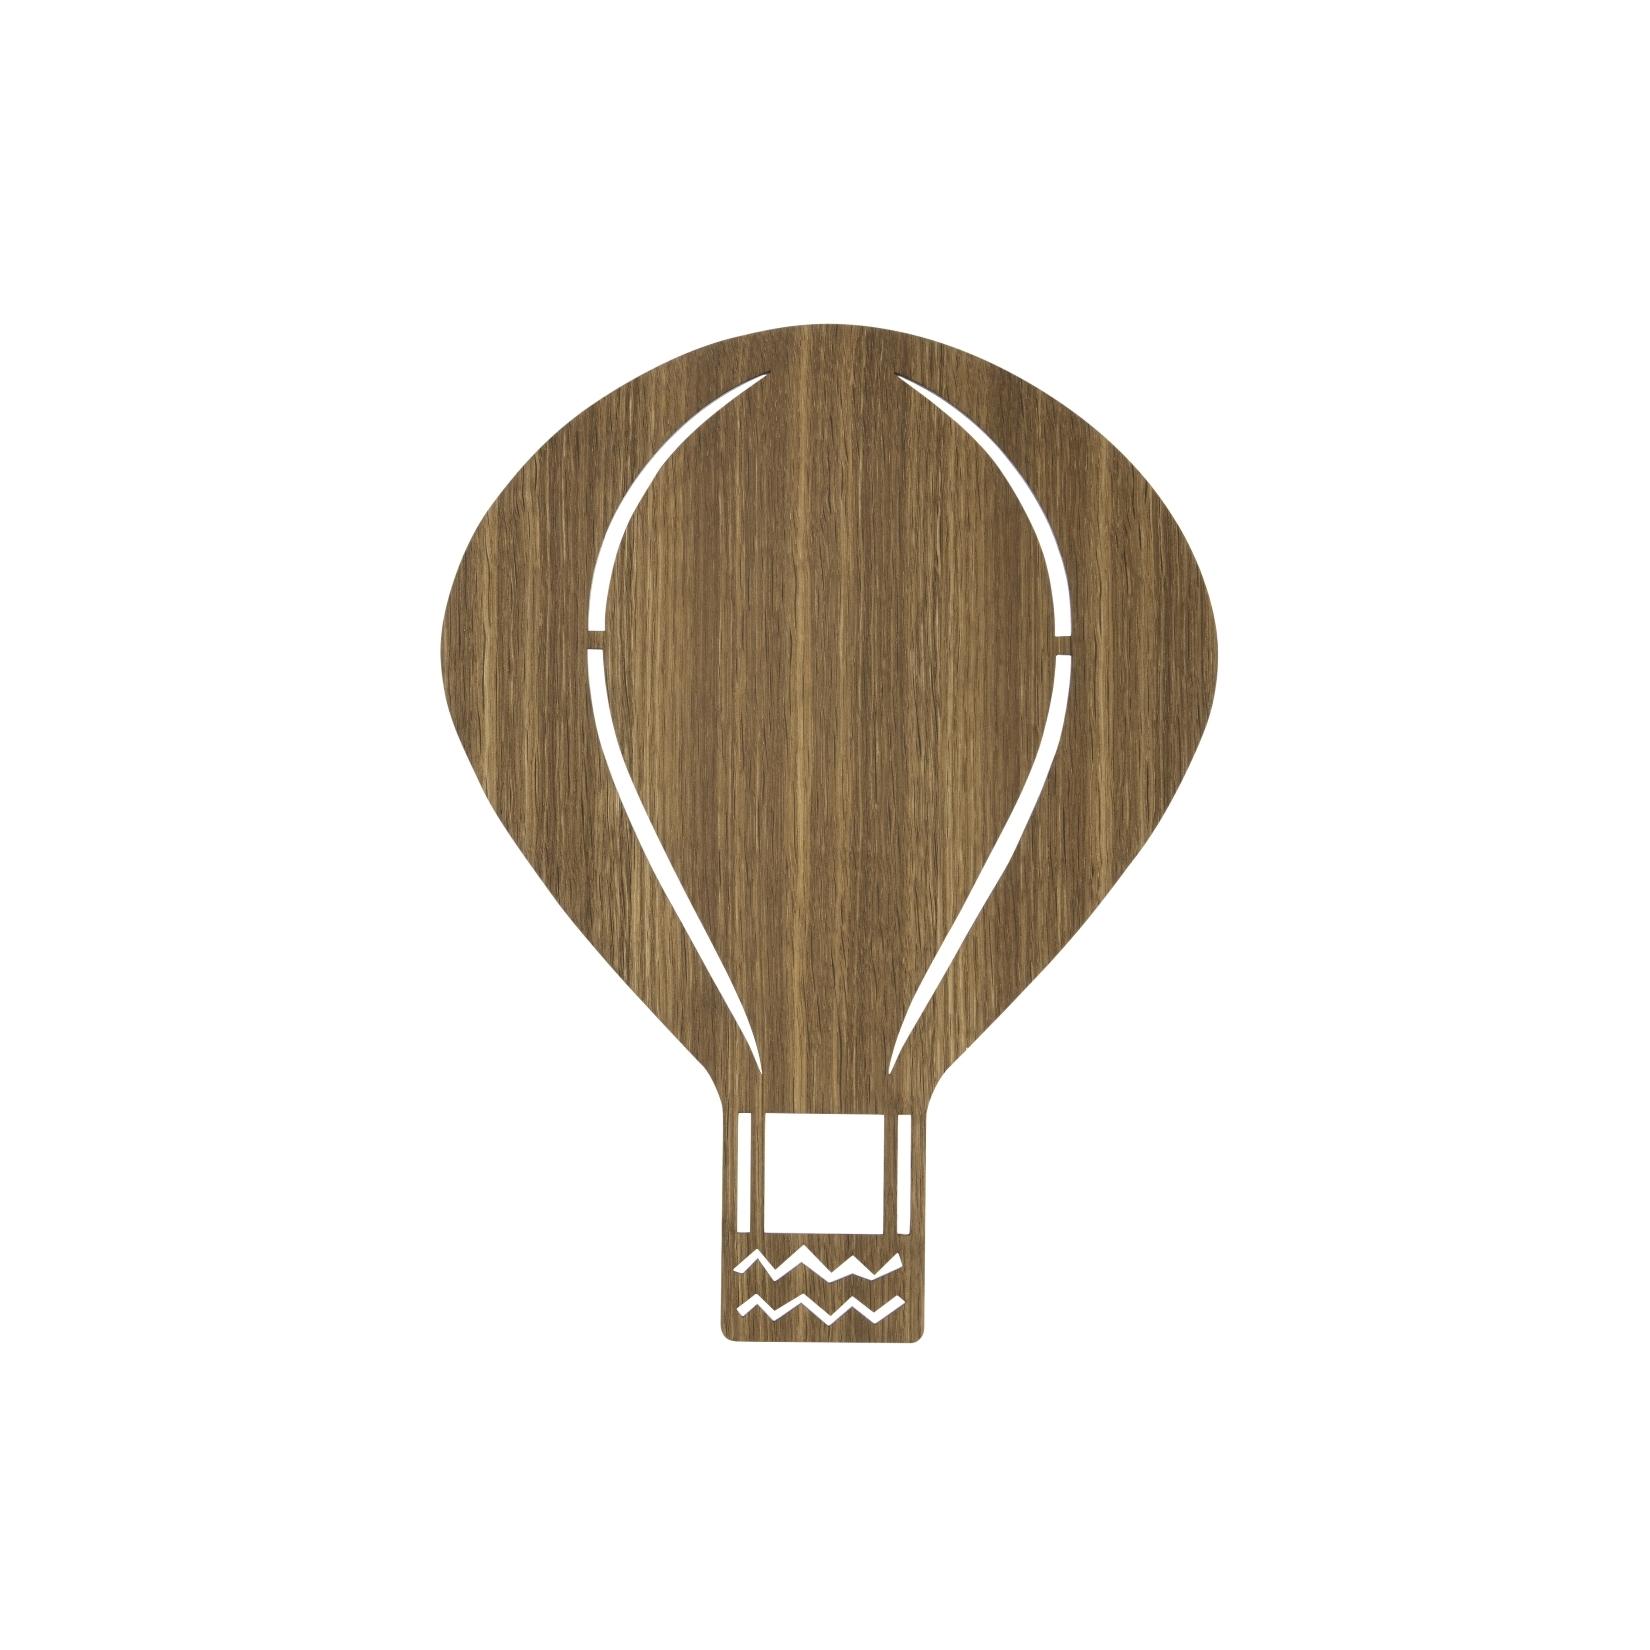 Barnlampa Air Balloon smoked oak, Ferm Living